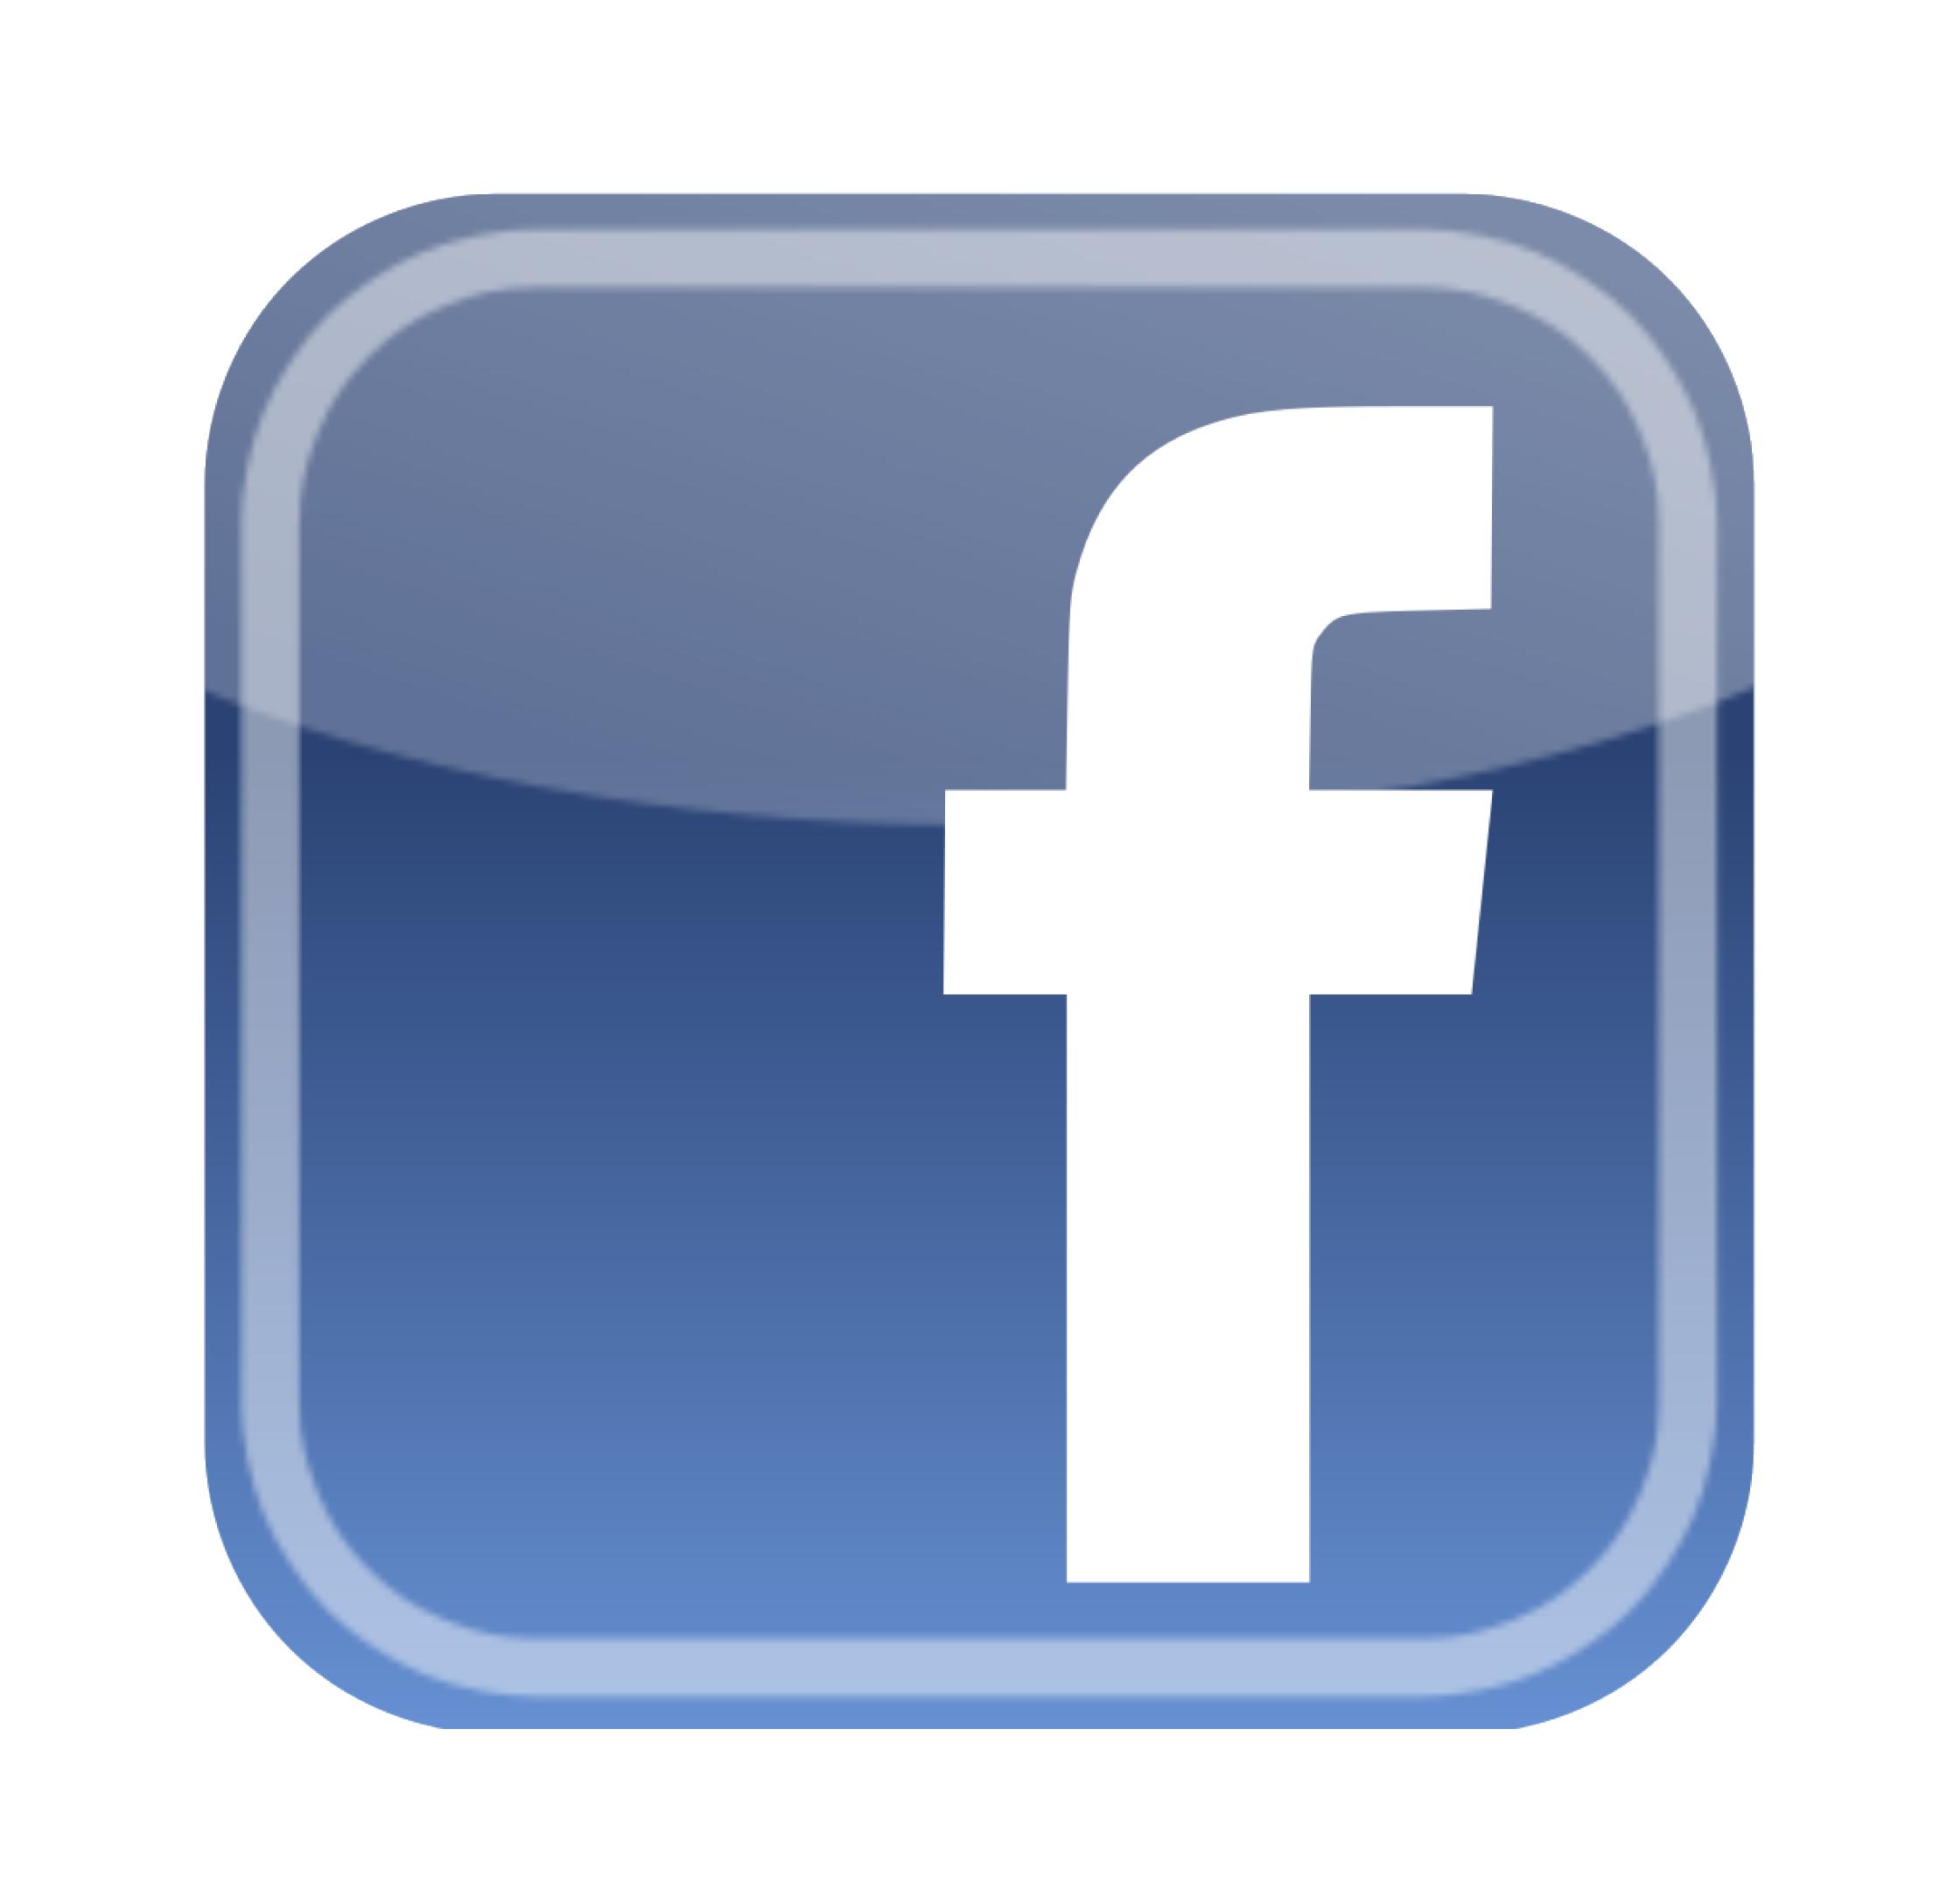 Facebook Facebook Cover Images Facebook Image Dimensions Facebook Cover